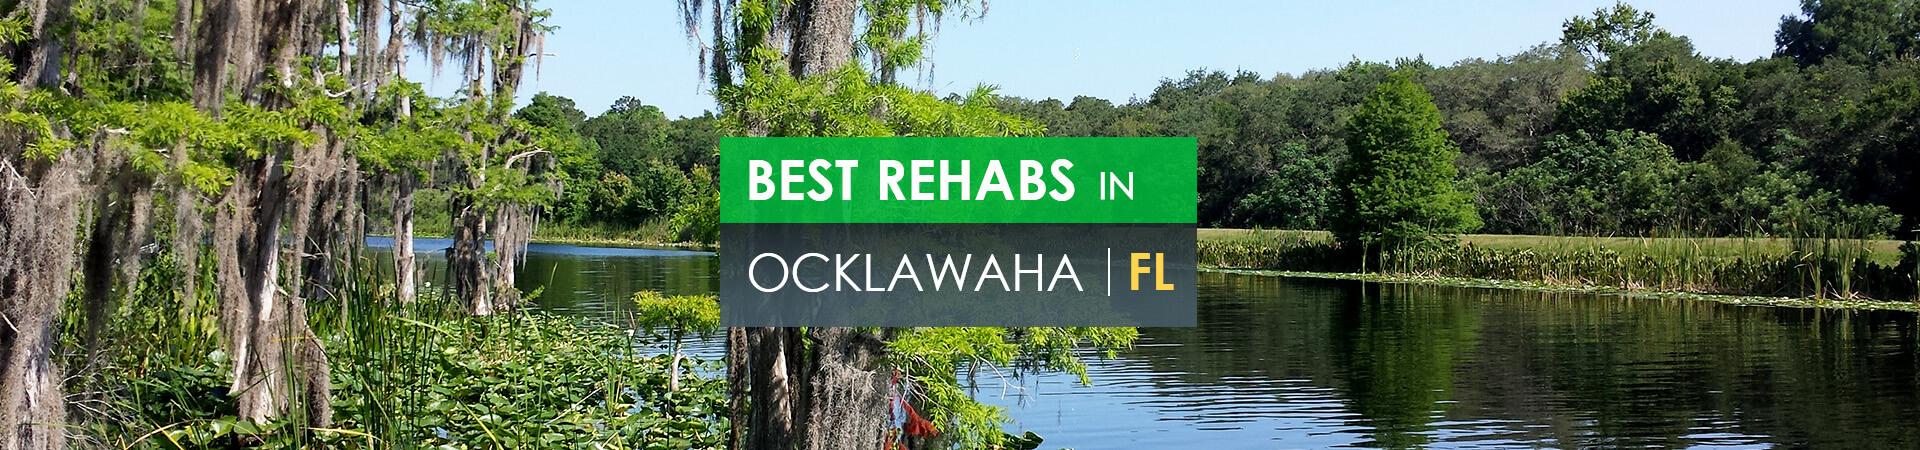 Best rehabs in Ocklawaha, FL